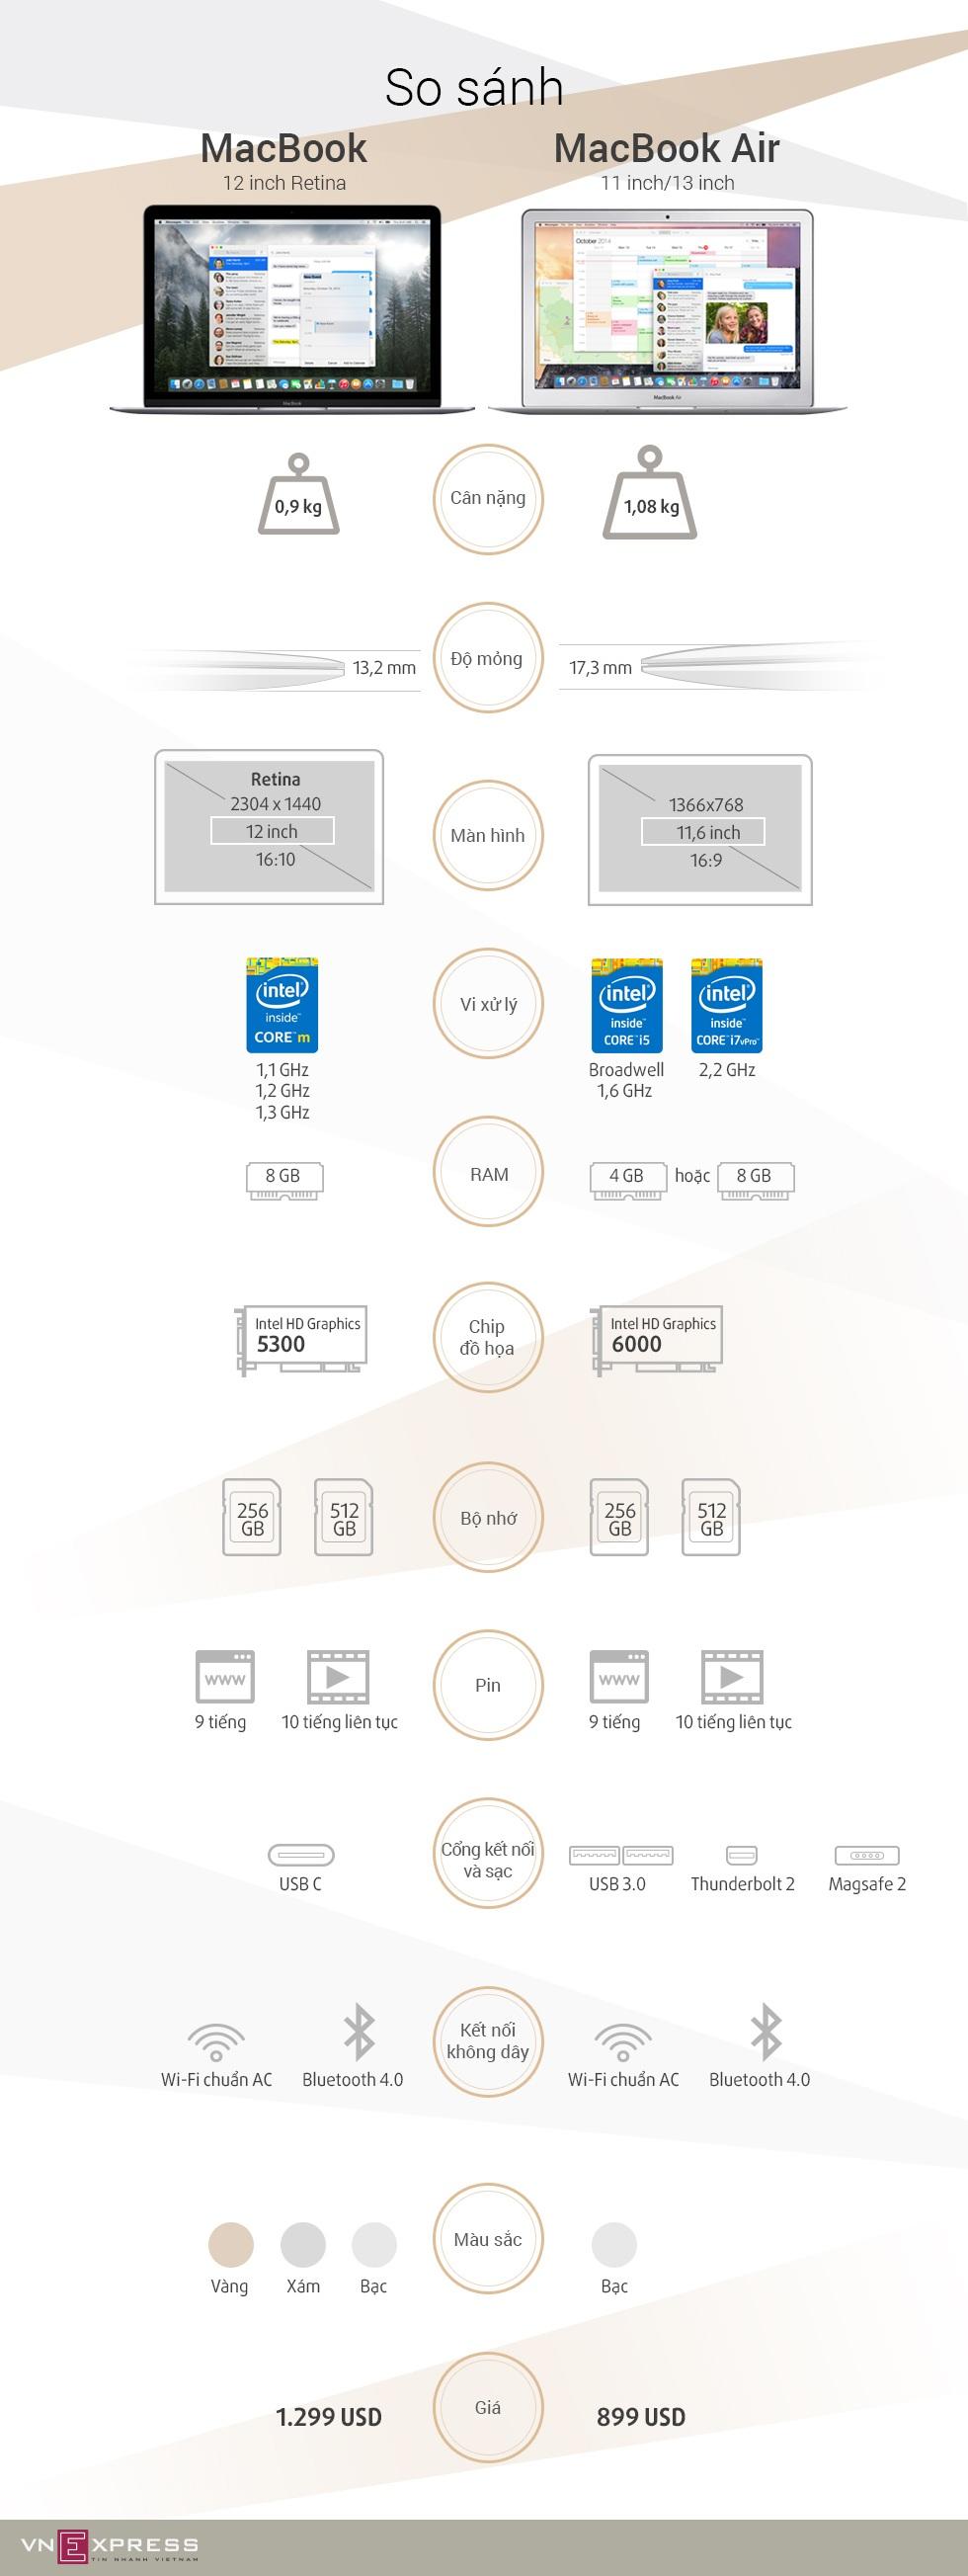 Infographic - So Sánh MacBook và MacBook Air